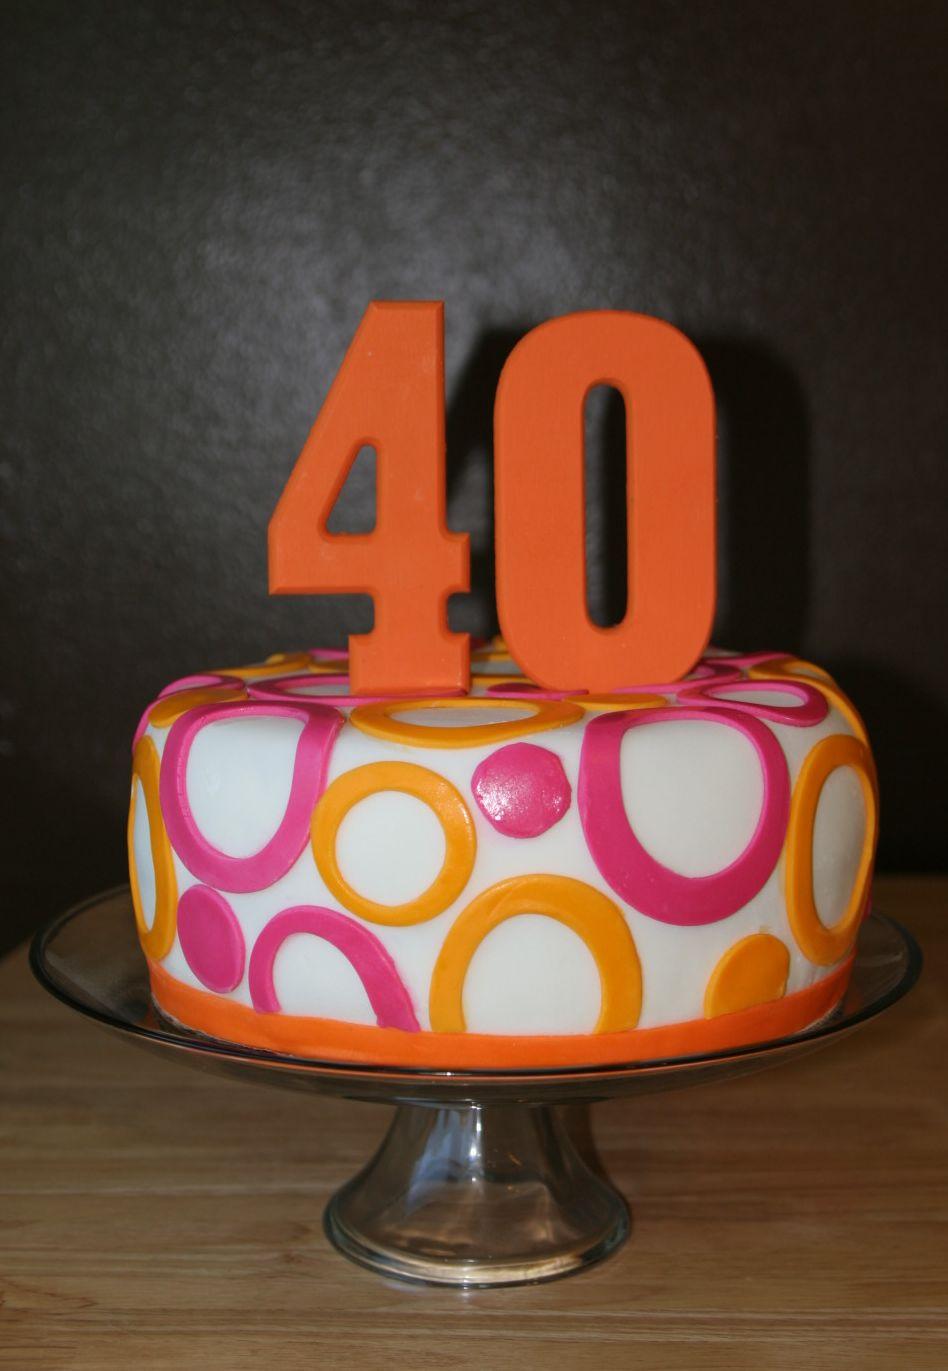 Purple Paisley Designs Cake Design 40th Birthday Party